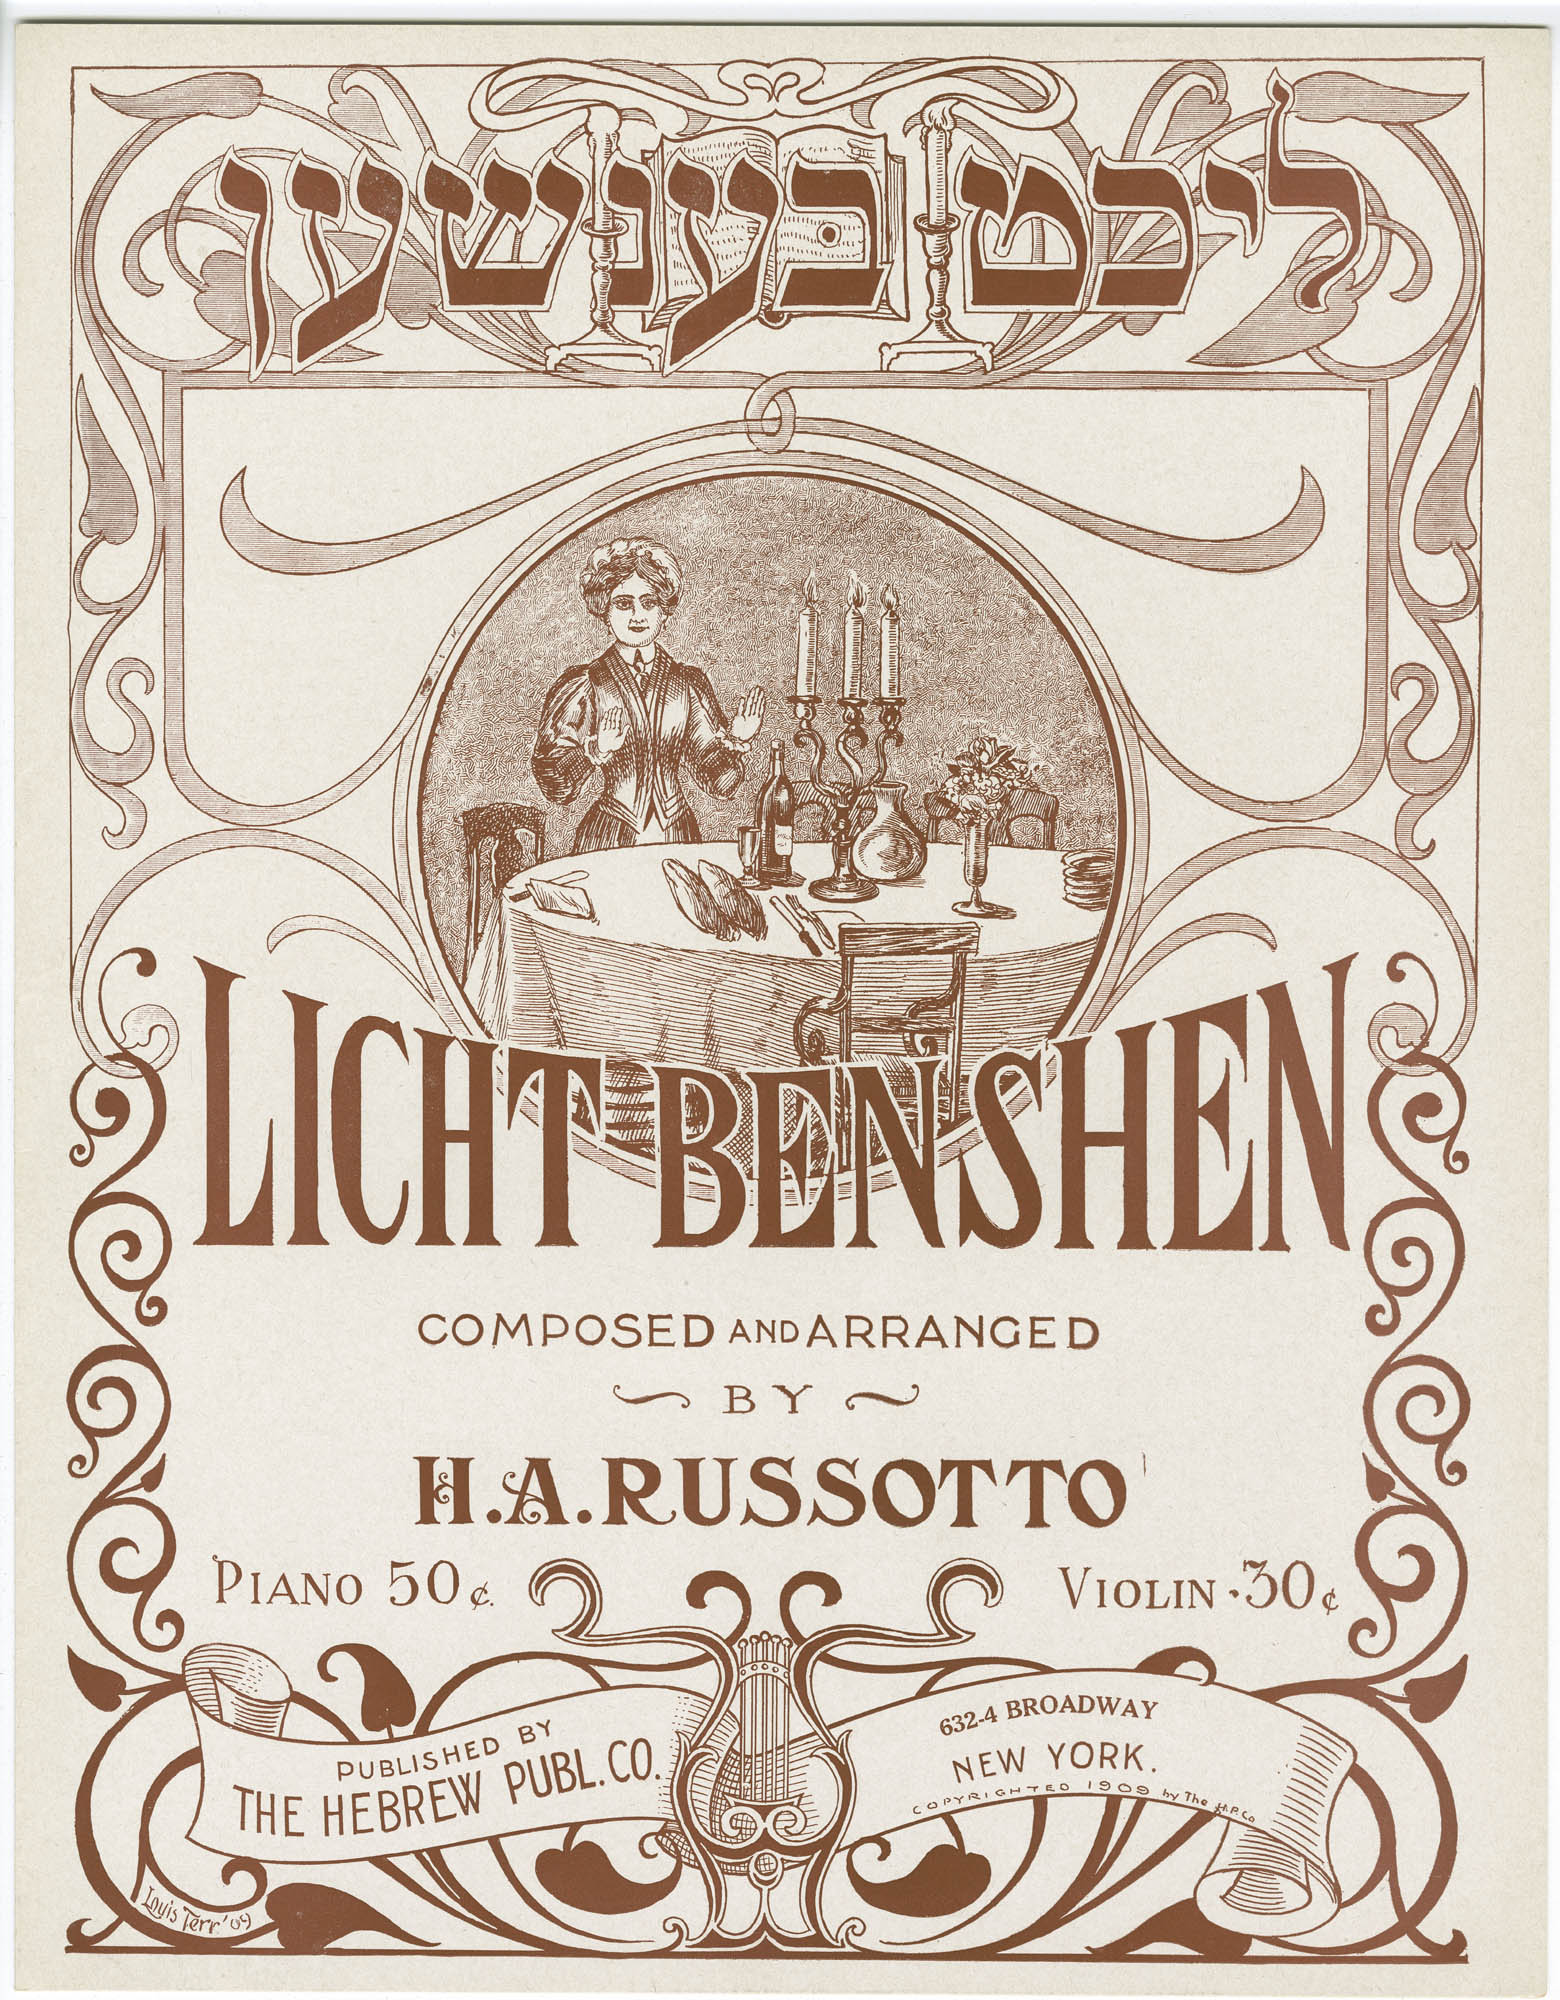 Licht benshen / ליכט בענשען